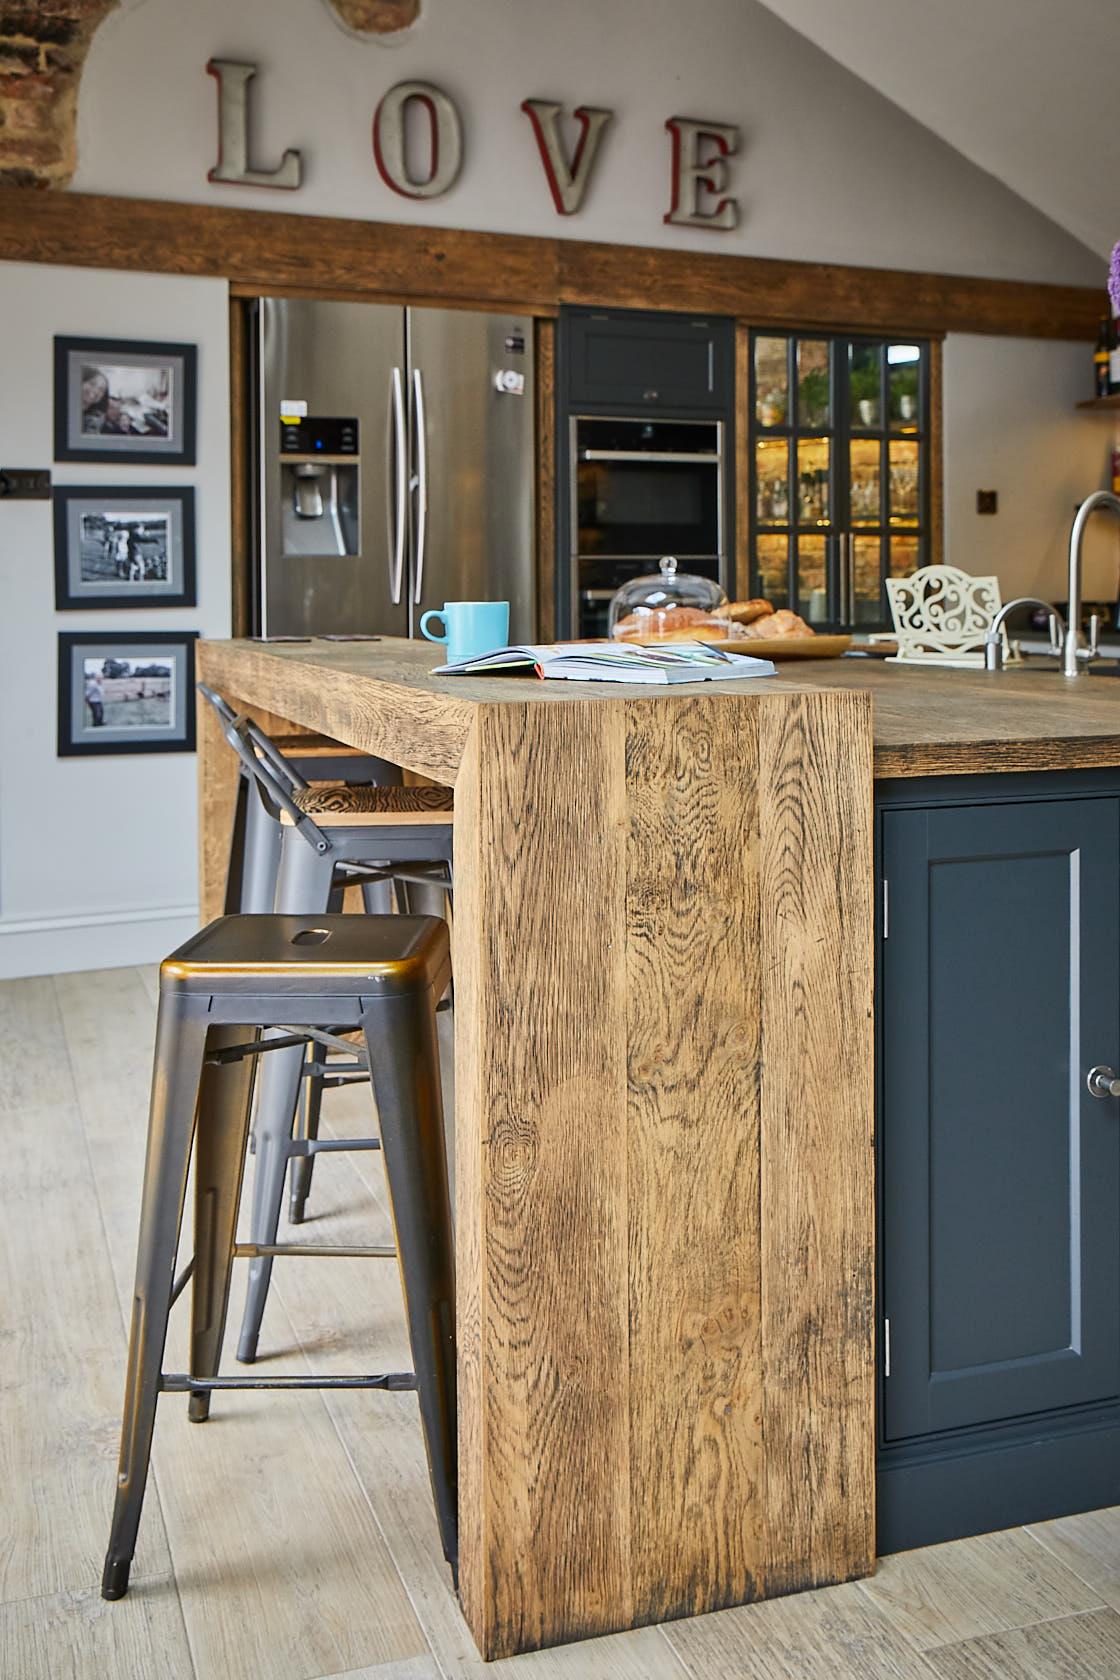 Wrap around chunky oak breakfast bar with industrial metal bar stool